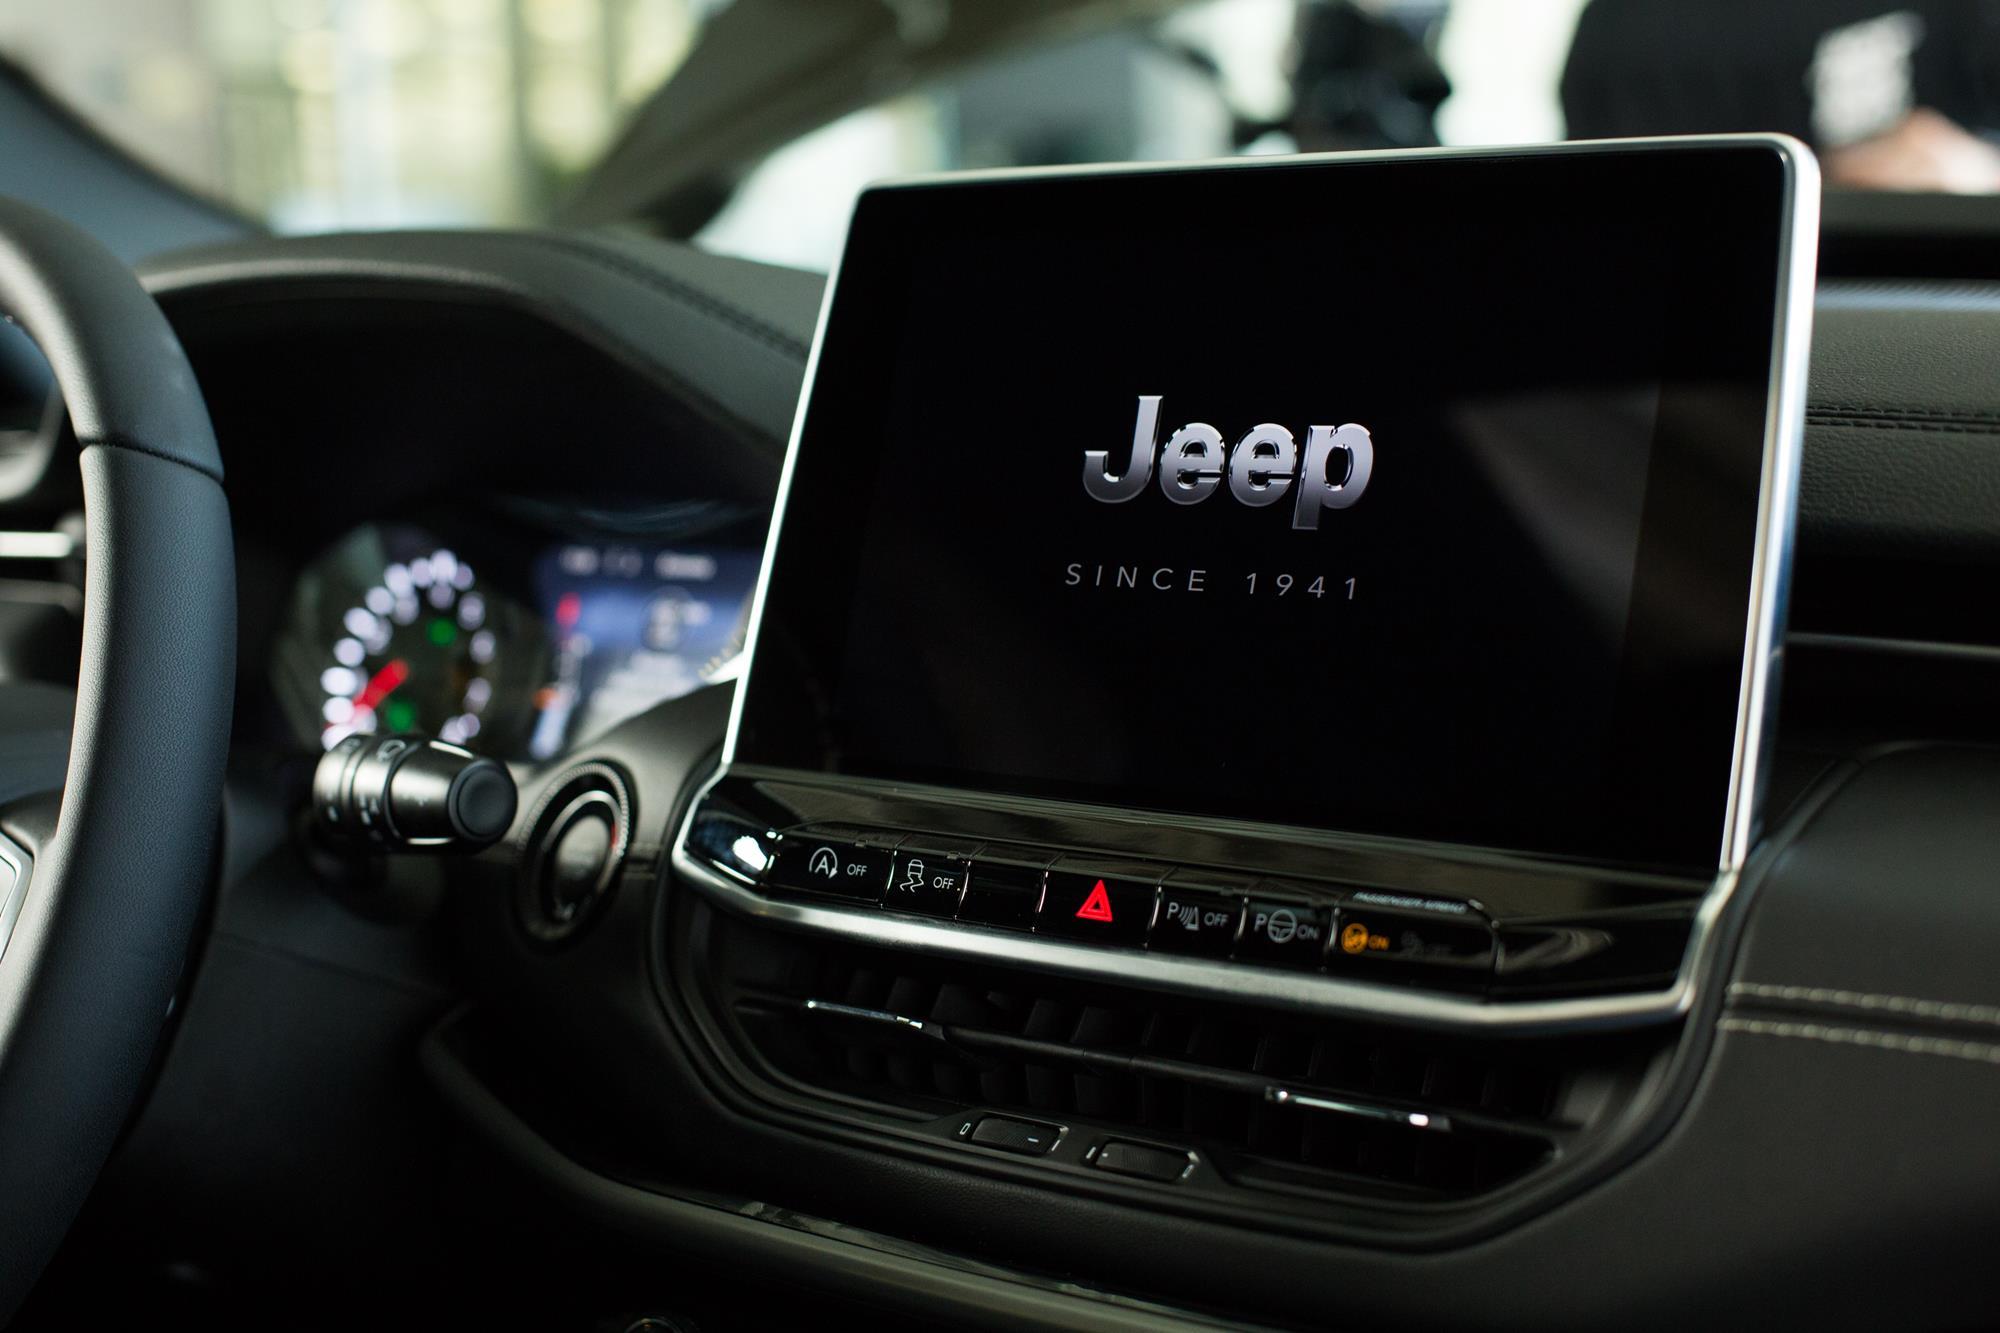 central multimídia do Jeep Compass 2022 80 anos